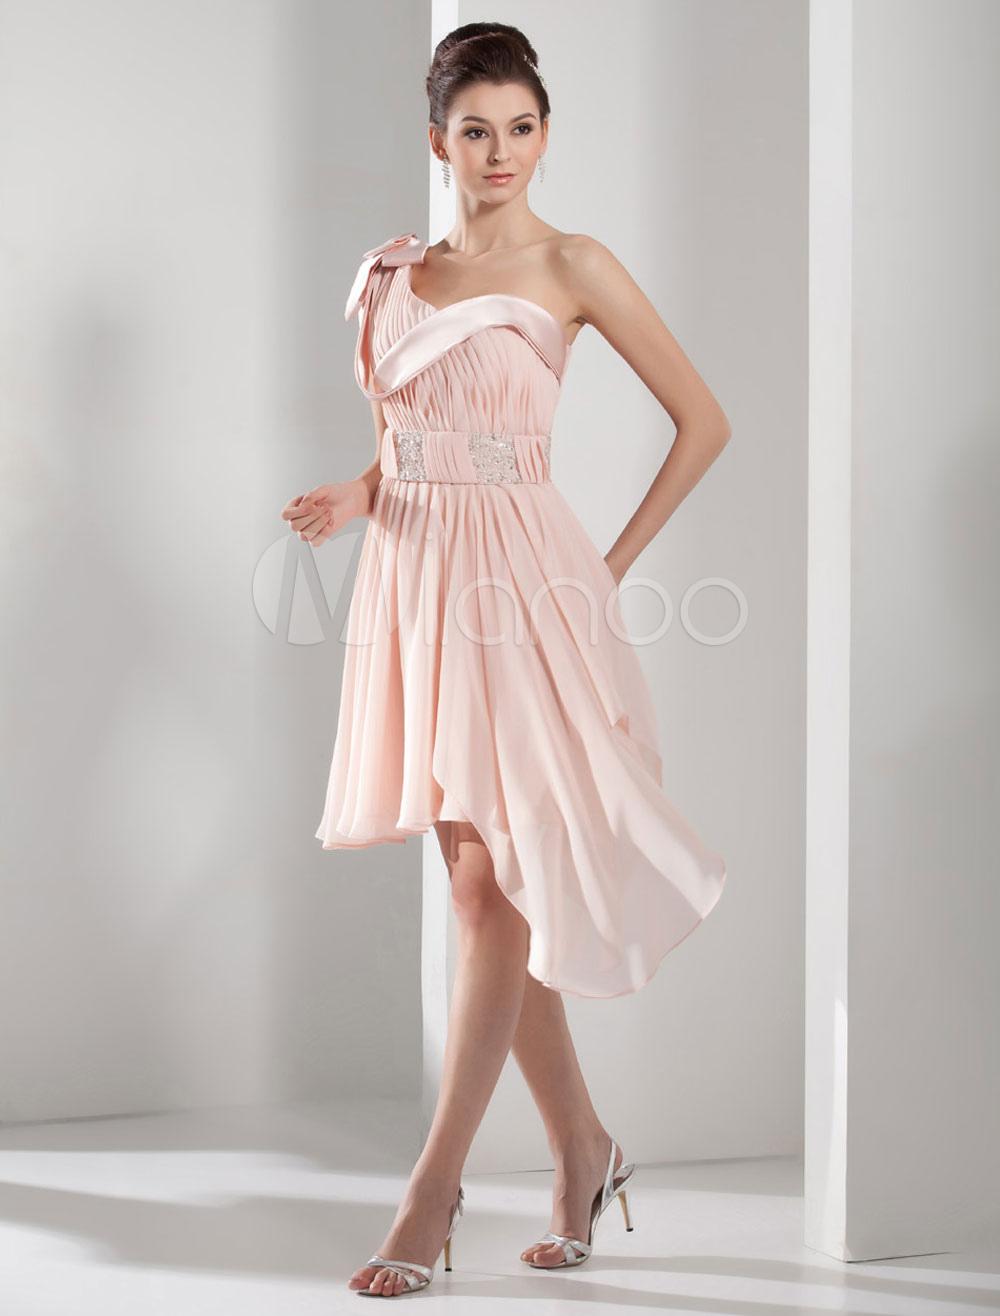 One-Shoulder Homecoming Dress Pleated Beading A-Line Asymmetric Chiffon Cocktail Dress Mini Prom Dress Milanoo